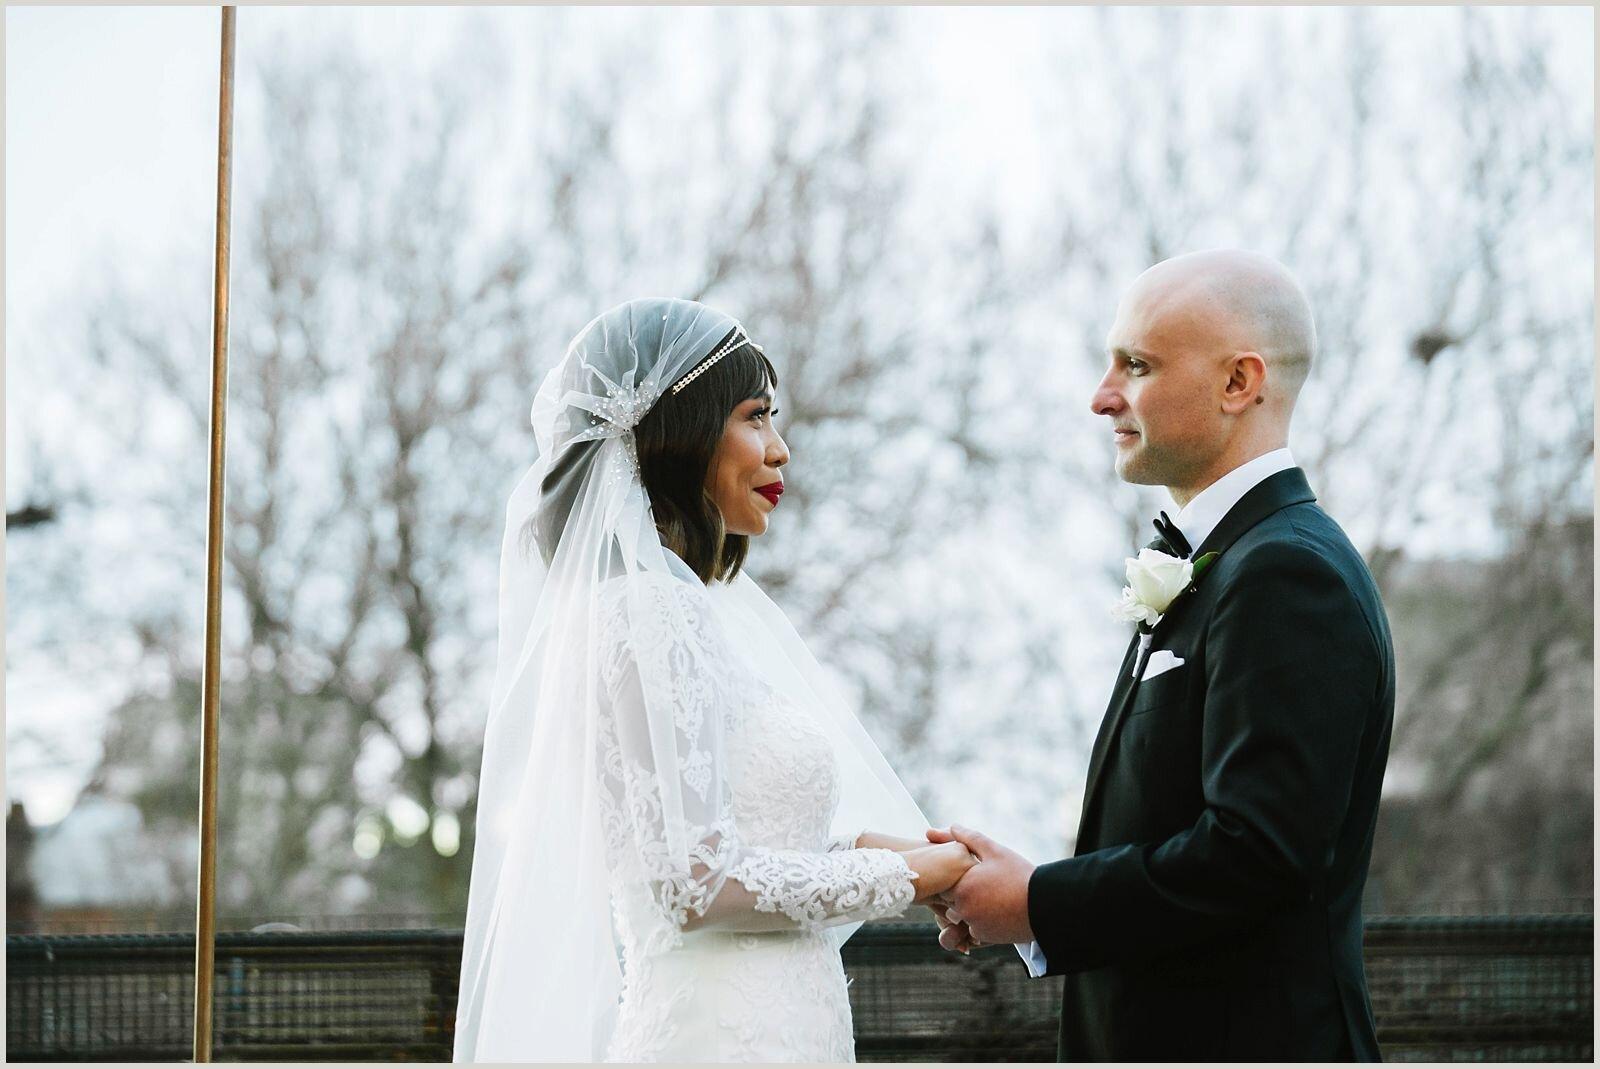 joseph_koprek_wedding_melbourne_the_prince_deck_0060.jpg